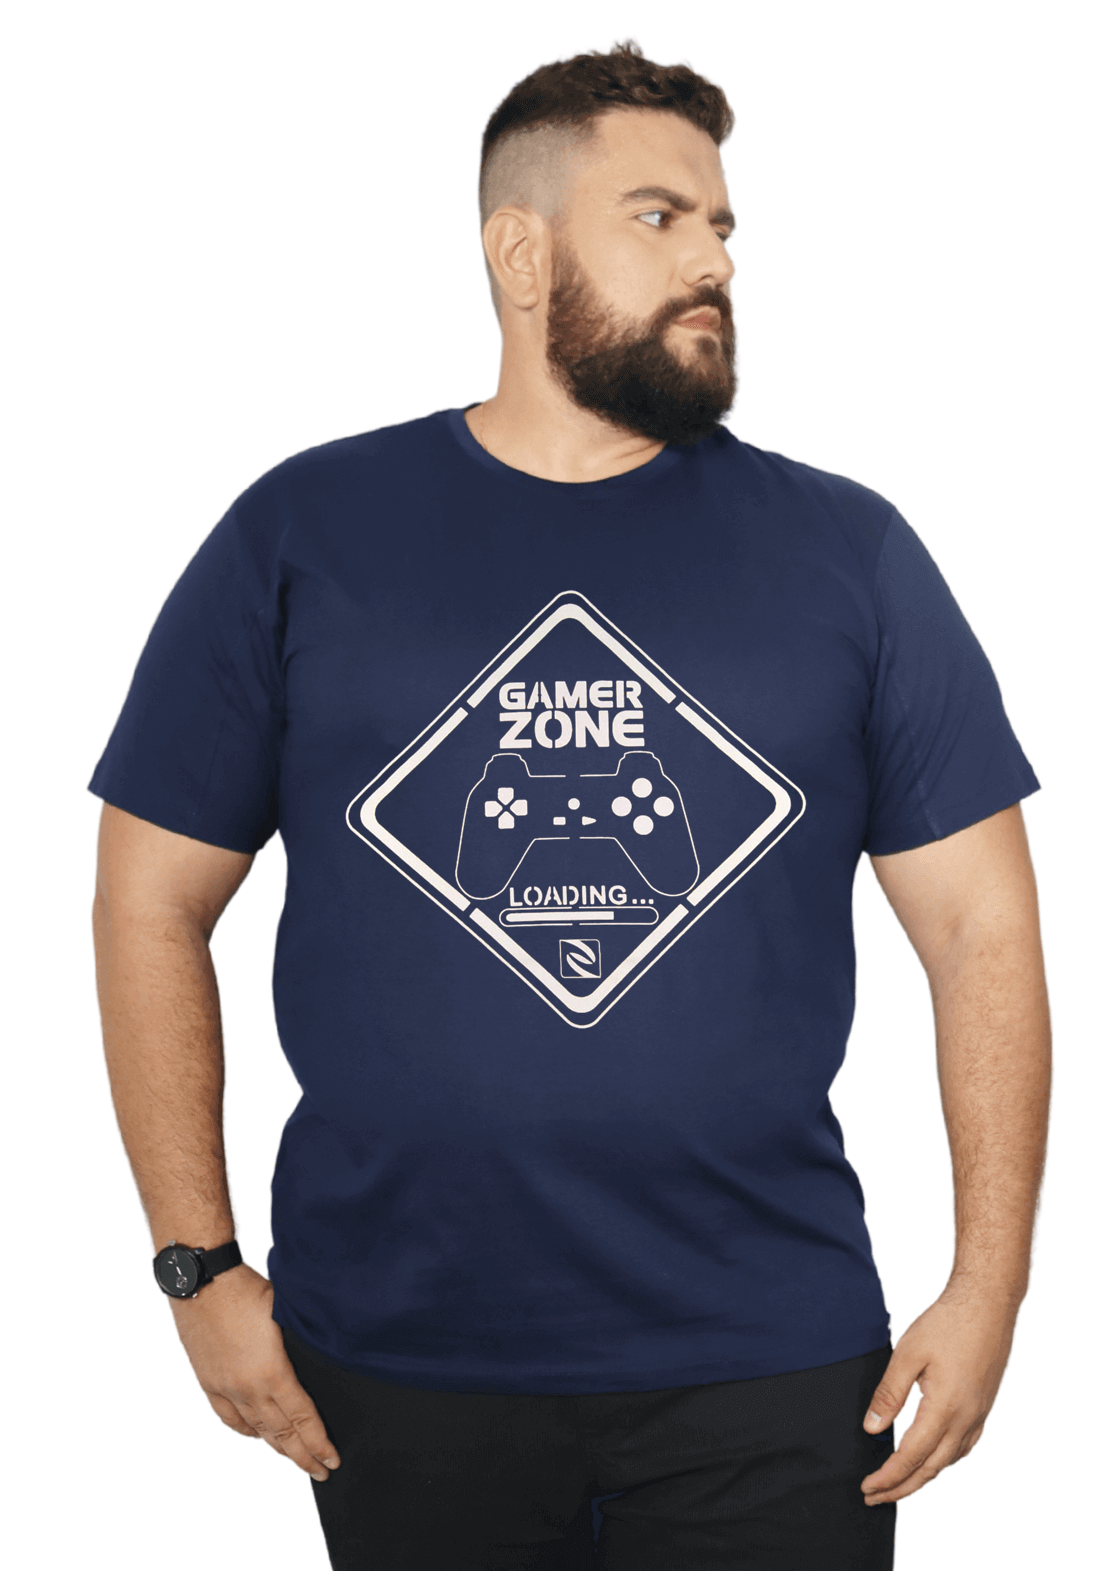 Camiseta Gamer Zone Plus Size 100% Algodão